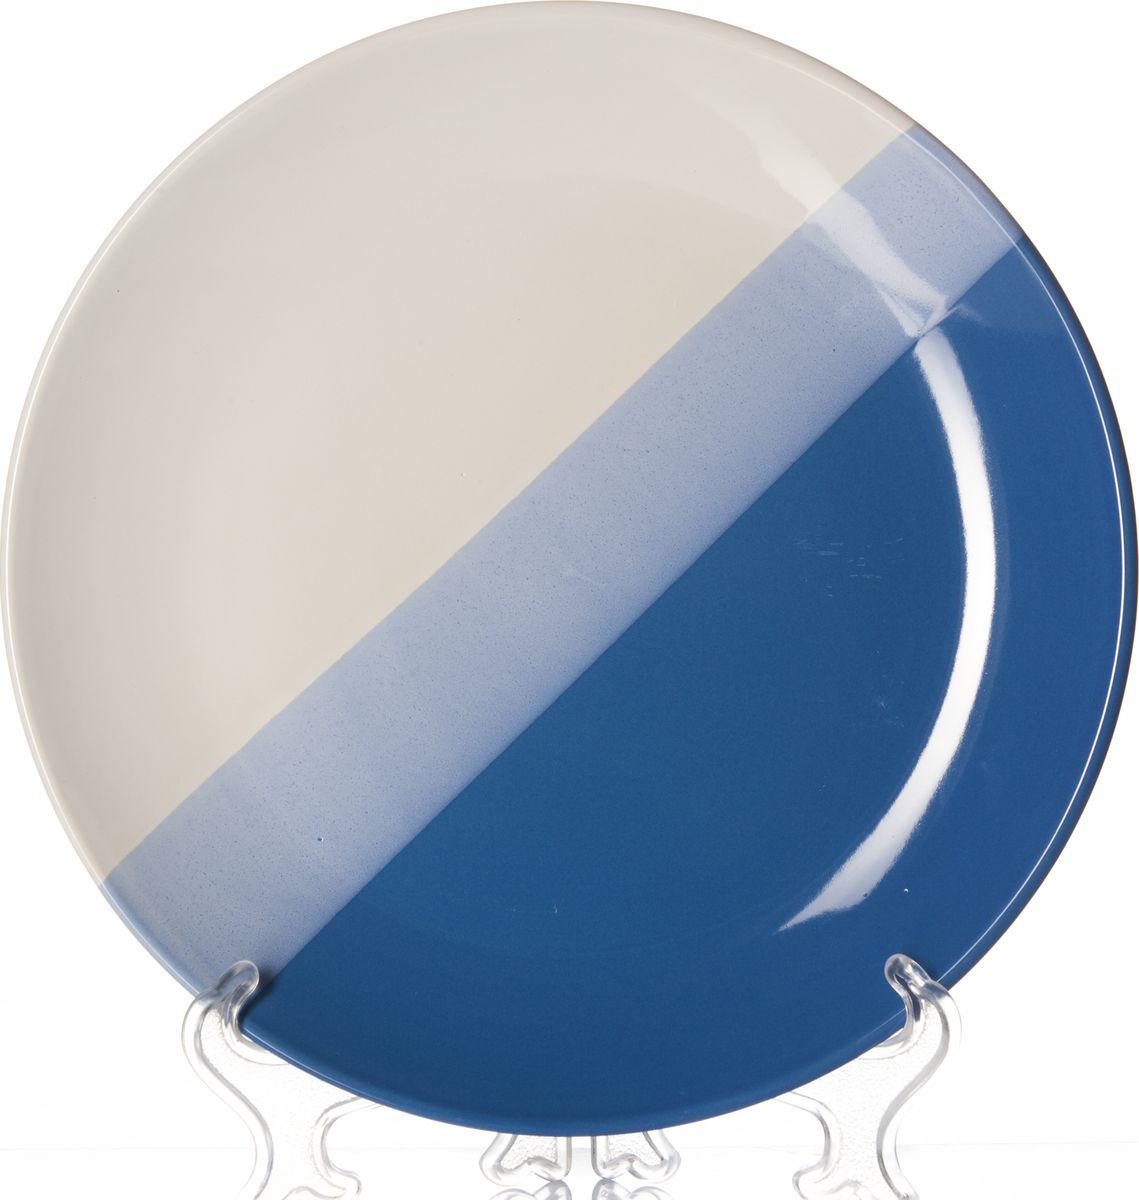 Тарелка Gotoff, 8221A1, синий, голубой, белый, диаметр 25,5 см тарелка глубокая gotoff цвет фисташковый диаметр 18 5 см